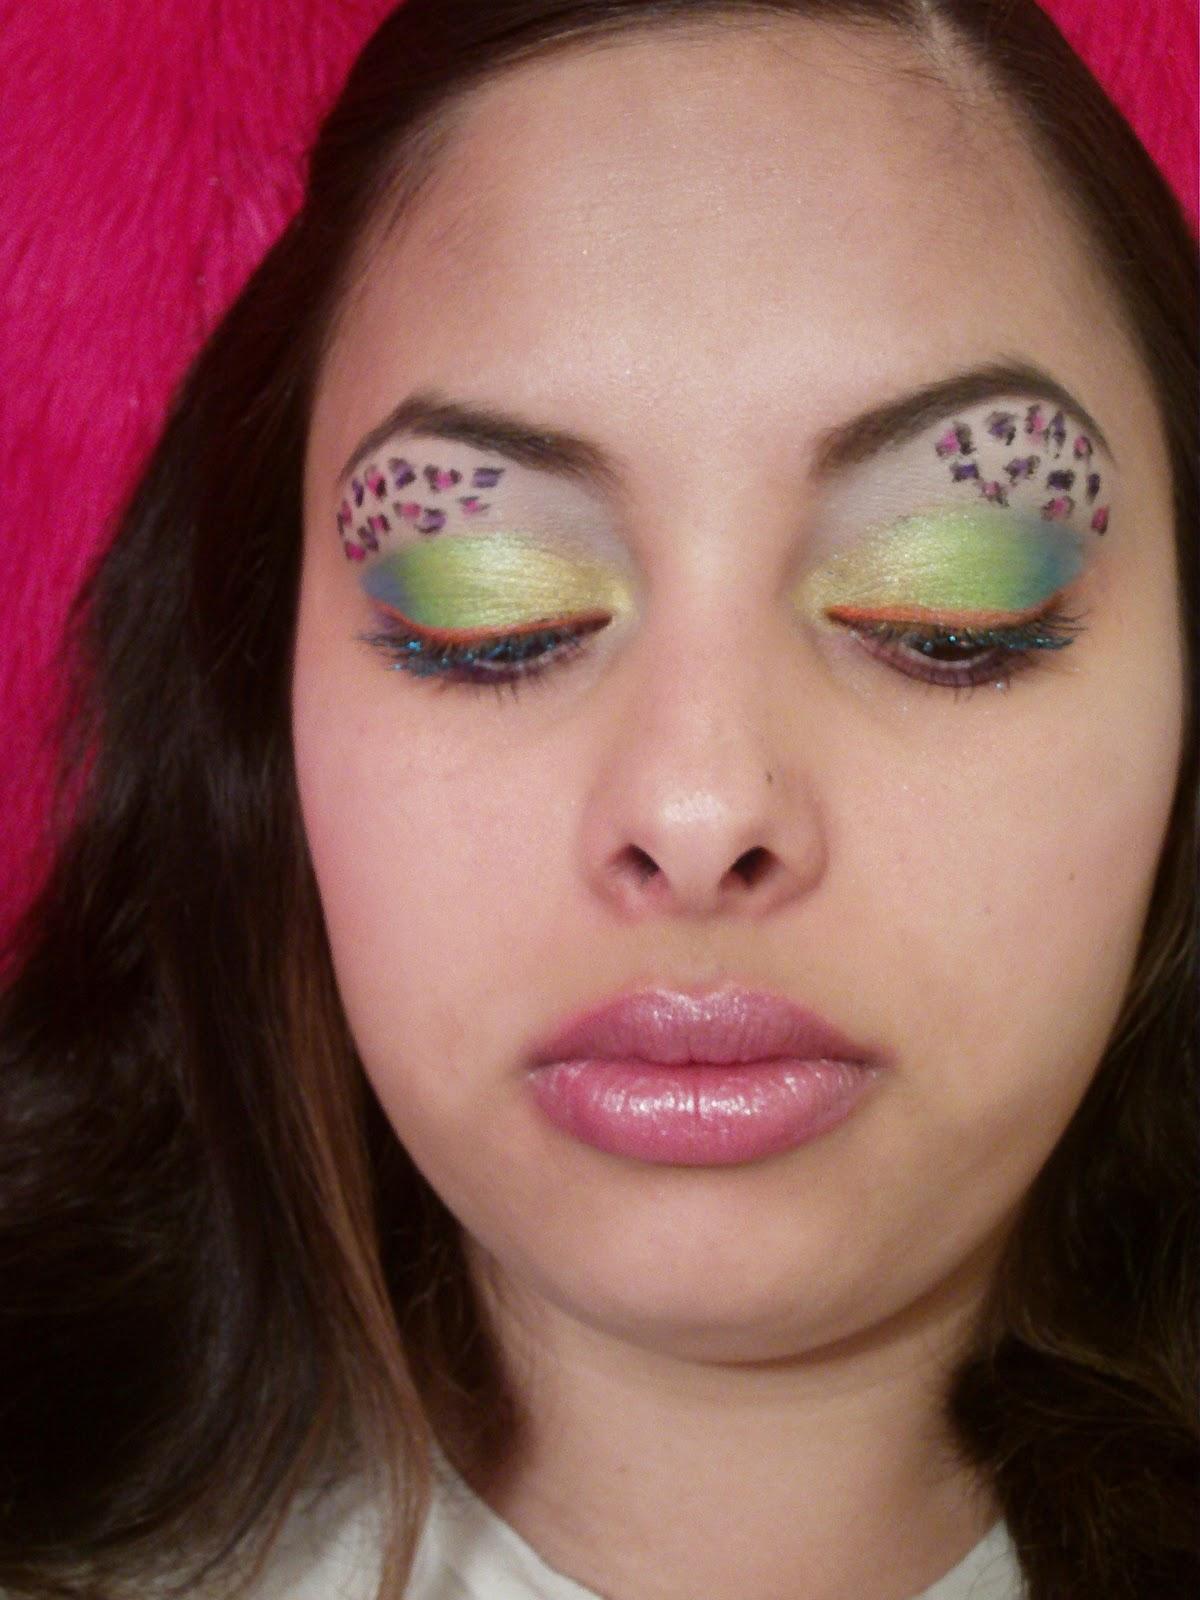 MsDivinemakeup's Beauty Blog: Lisa Frank Makeup Contest